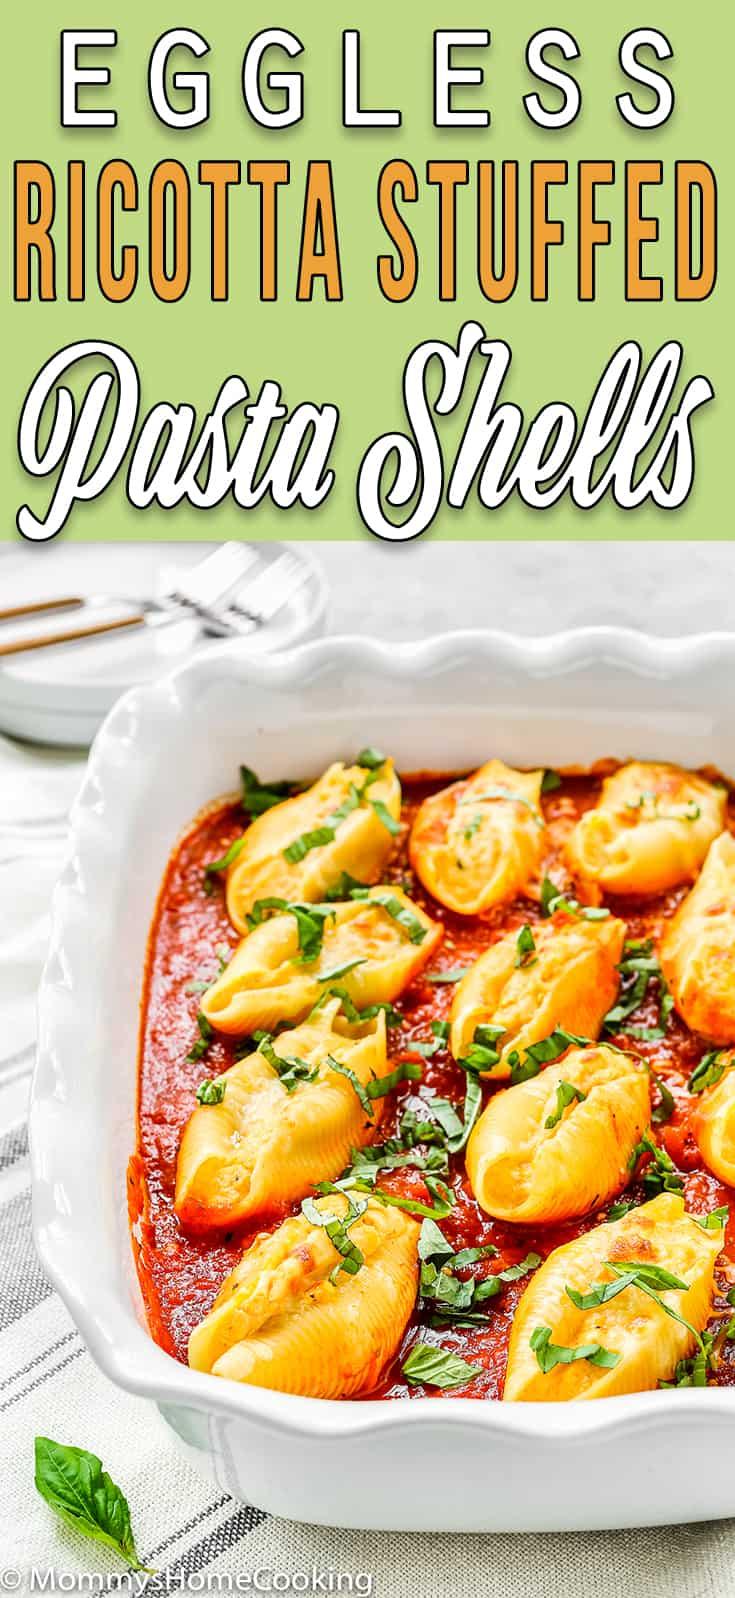 eggless pumpkin ricotta pasta shells with descriptive text